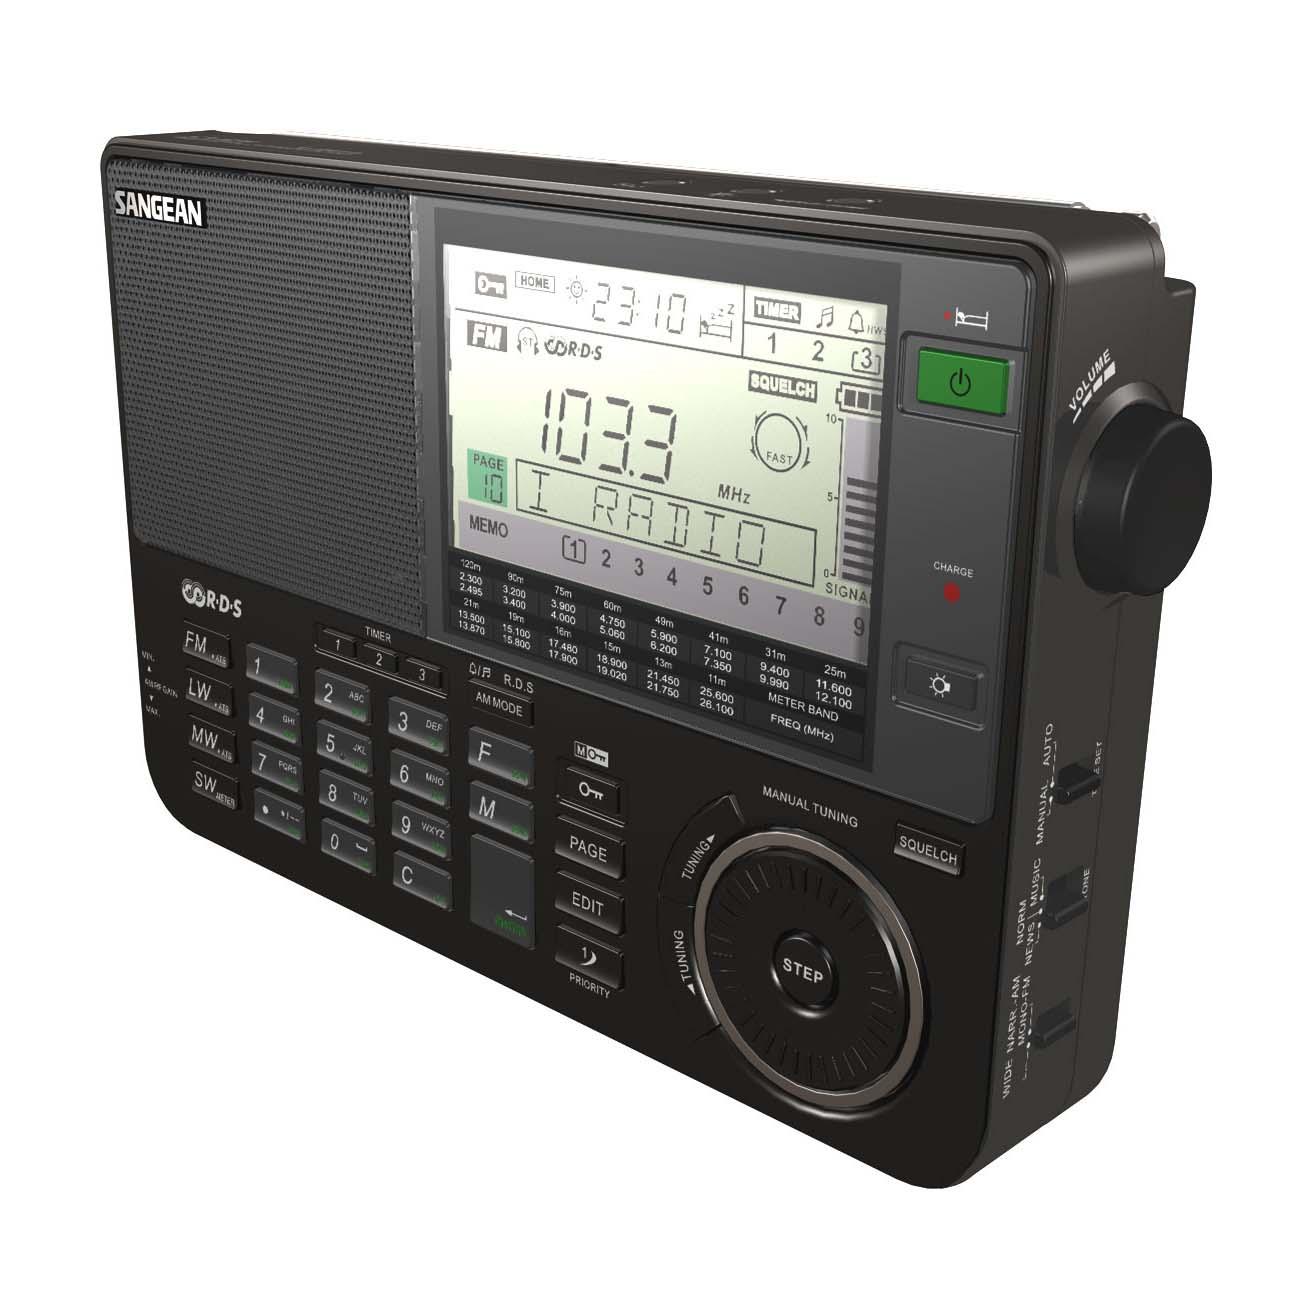 Sangean ATS-909BK FM-RBDS MW/LW/SW Radio - Black